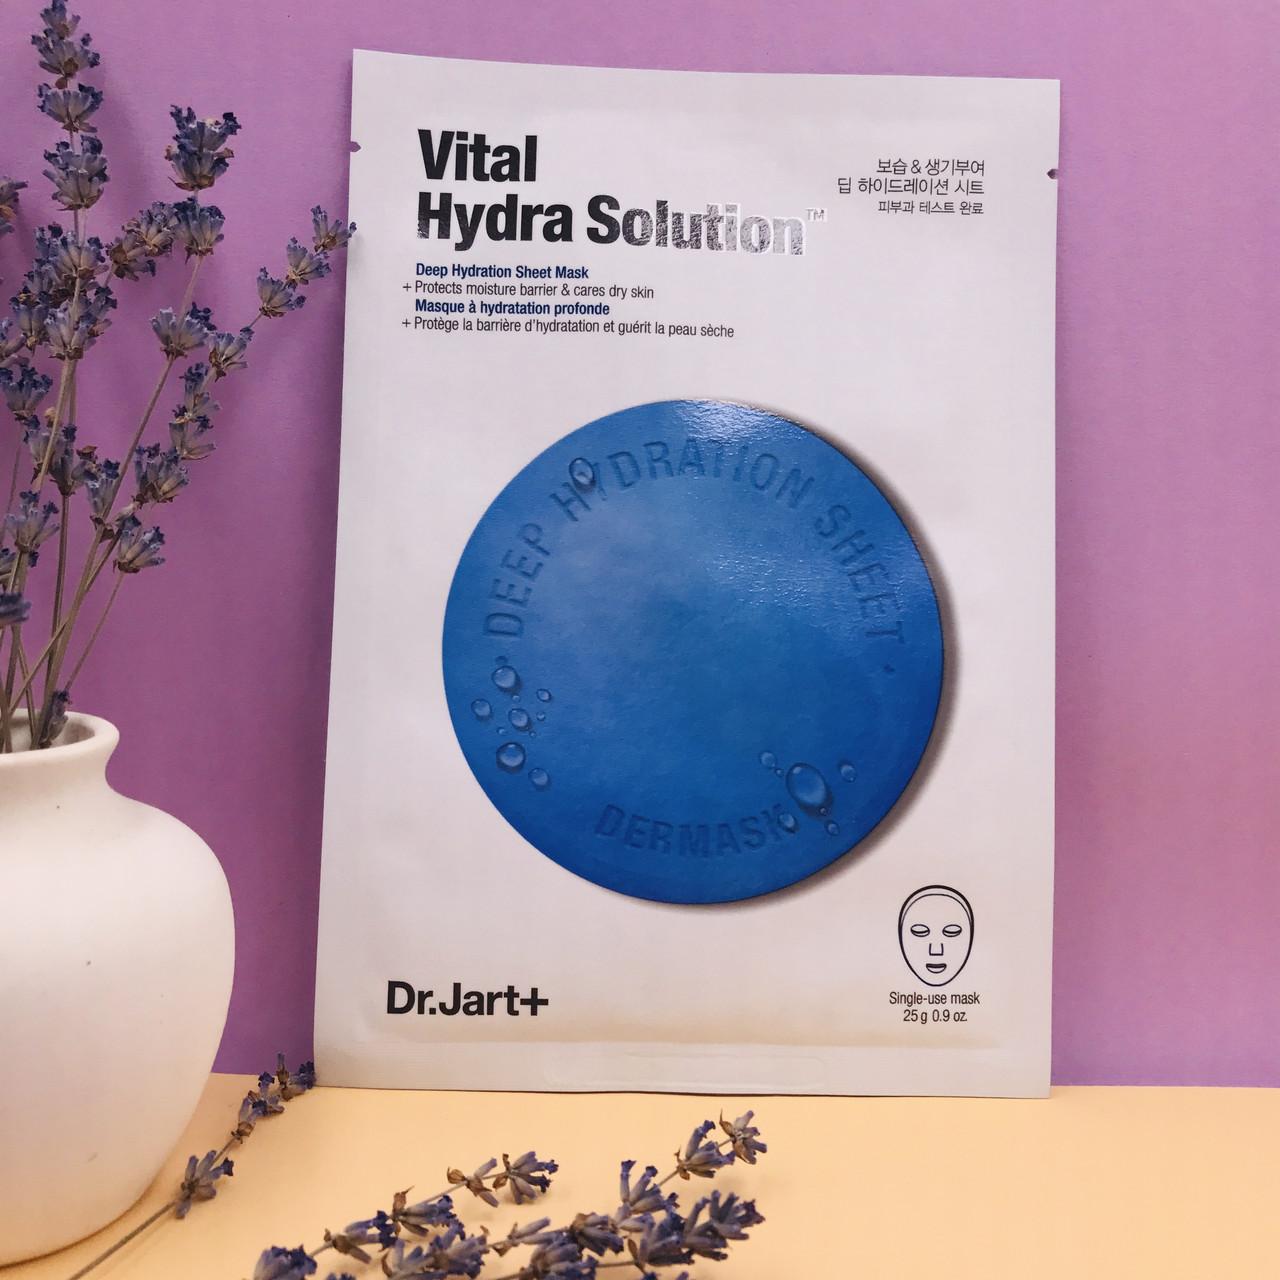 Dr. Jart+ Интенсивно увлажняющая маска для лица Dermask Water Jet Vital Hydra Solution